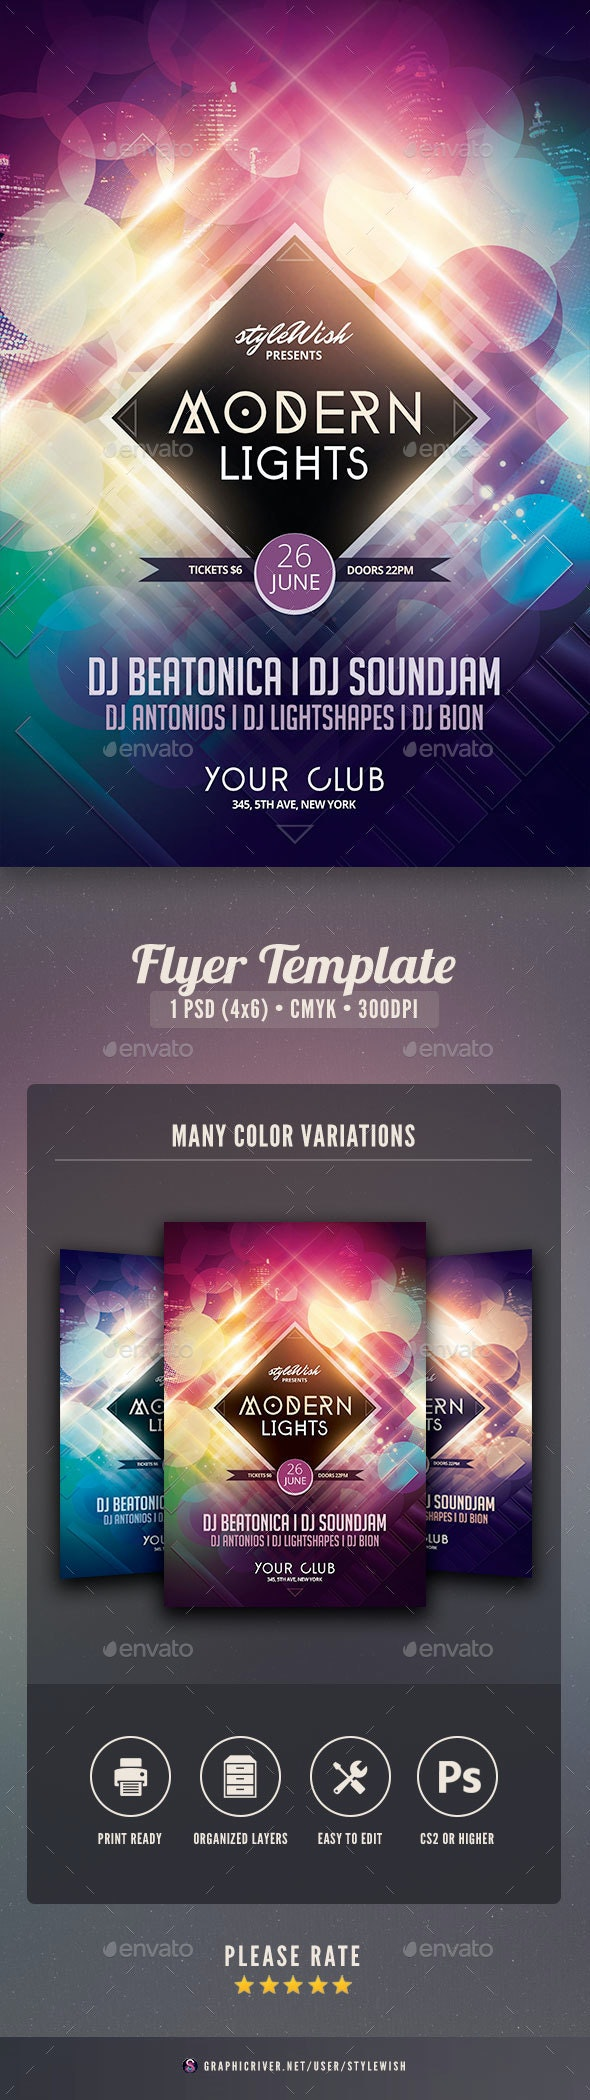 Modern Lights Flyer - Clubs & Parties Events